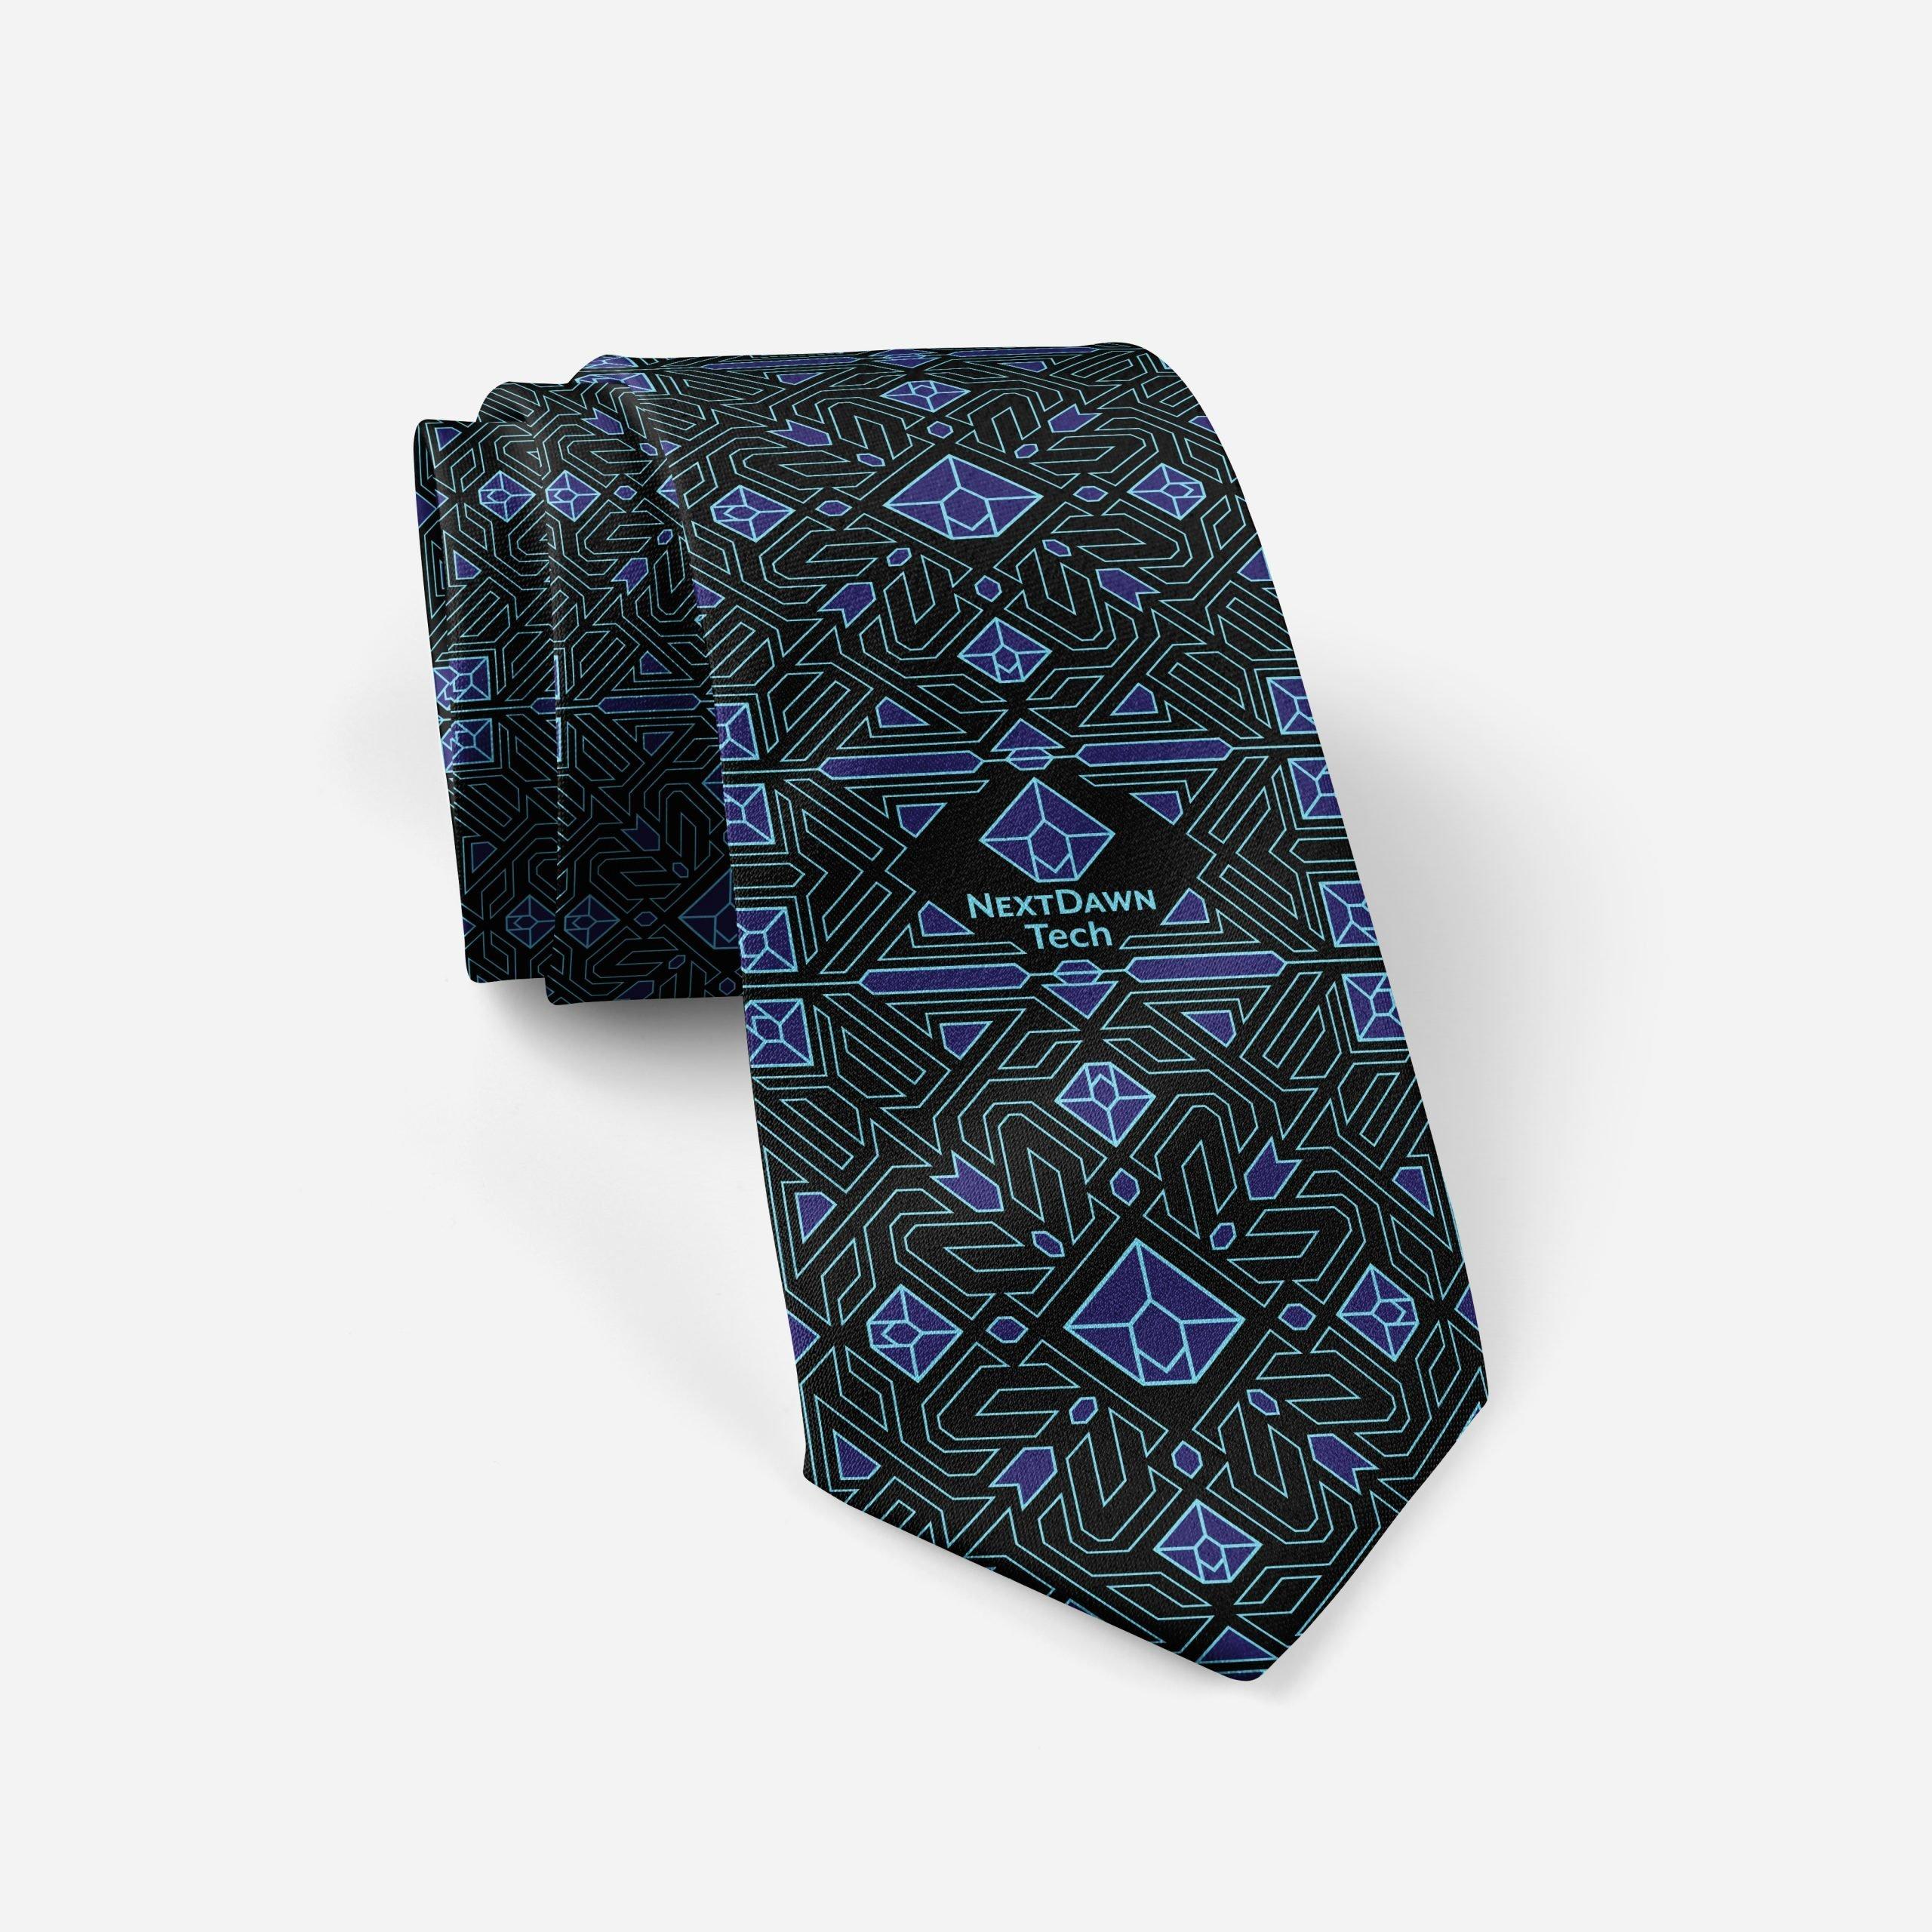 Necktie Corporate Gift Idea